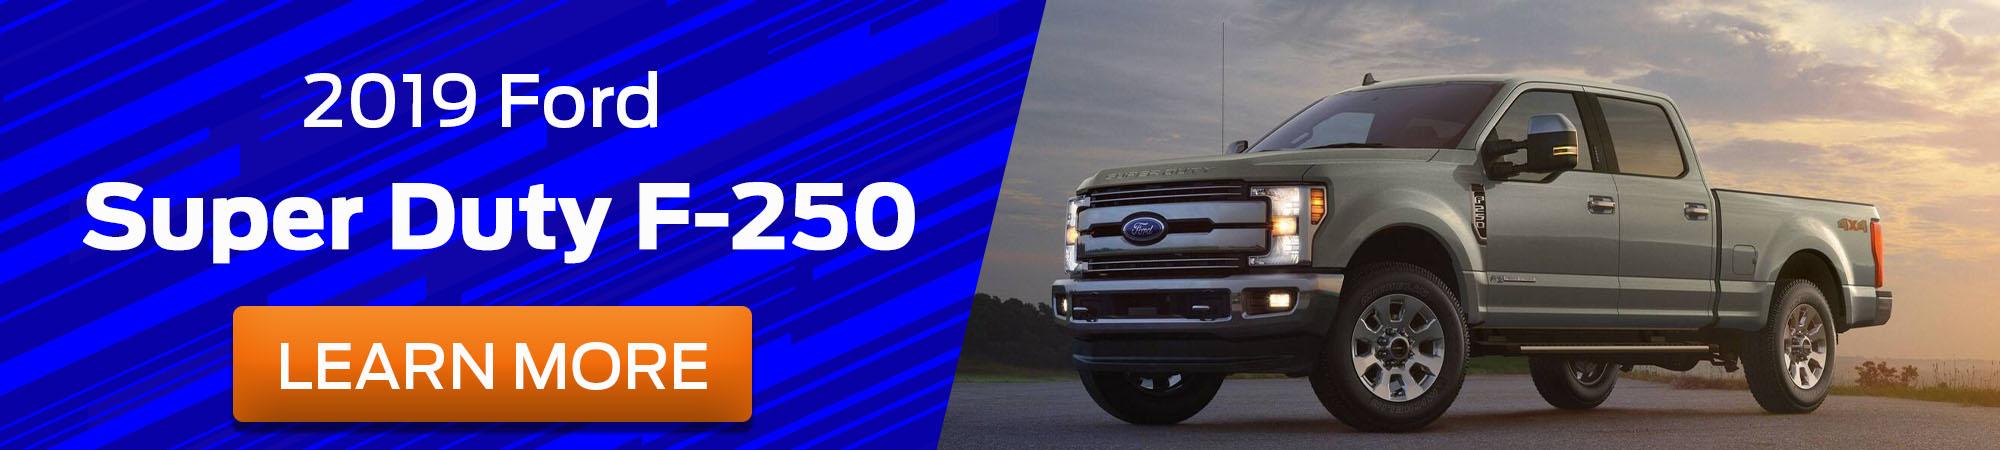 2019 Ford Super Duty F-250